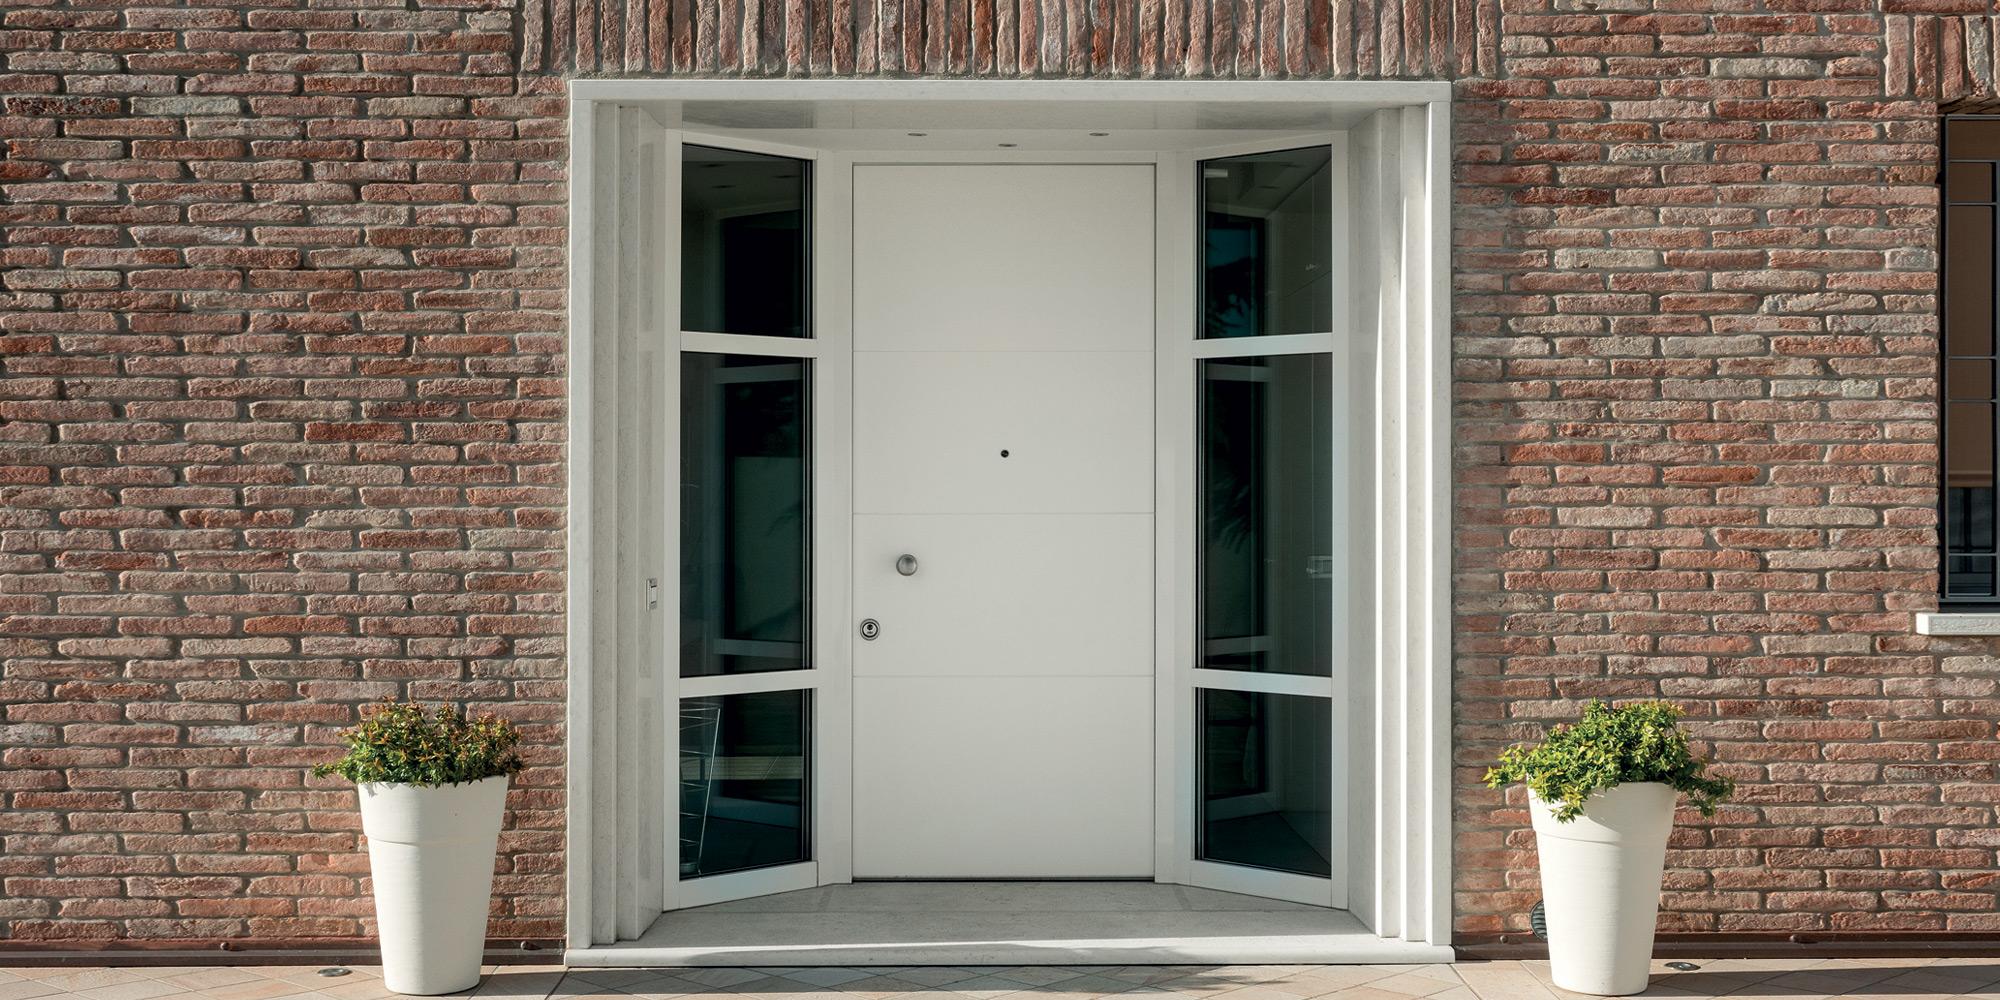 porte blindate vighi parma Vighi security doors produce porte blindate a una e due ante le porte blindate vighi possono avere chiusure a cilindro, a doppia mappa, o elettroniche vighi.